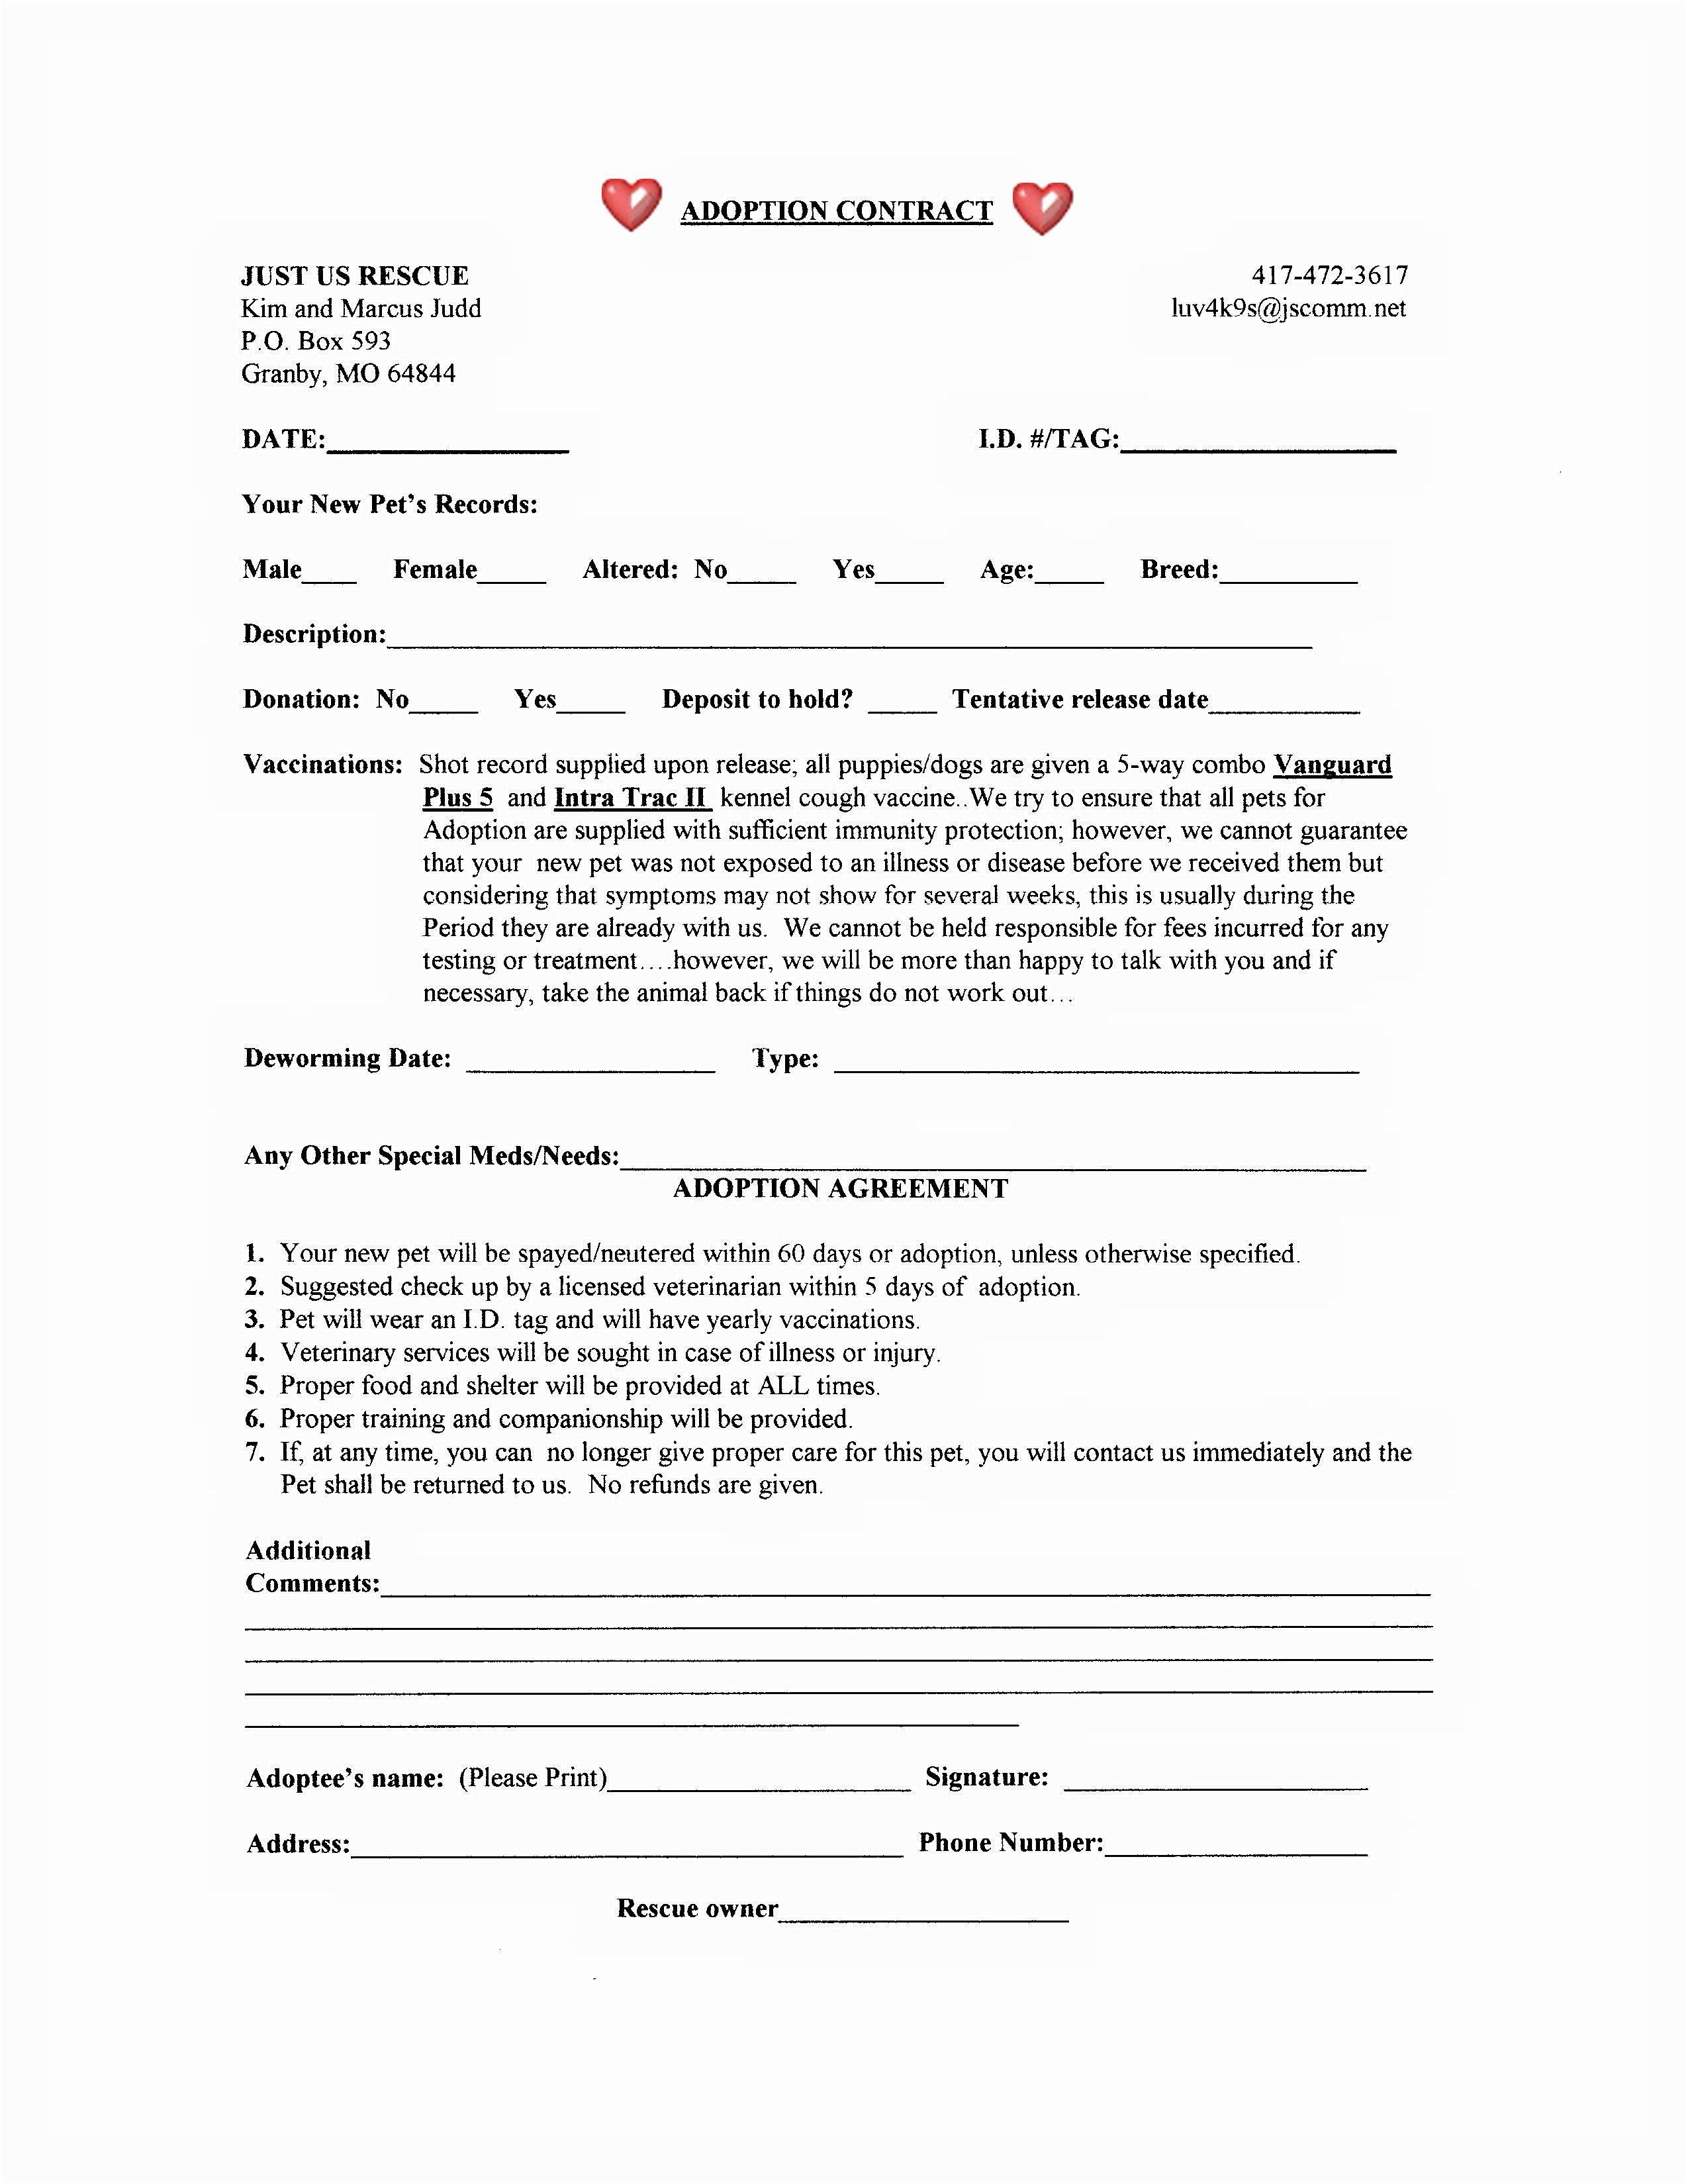 Adoption Contract